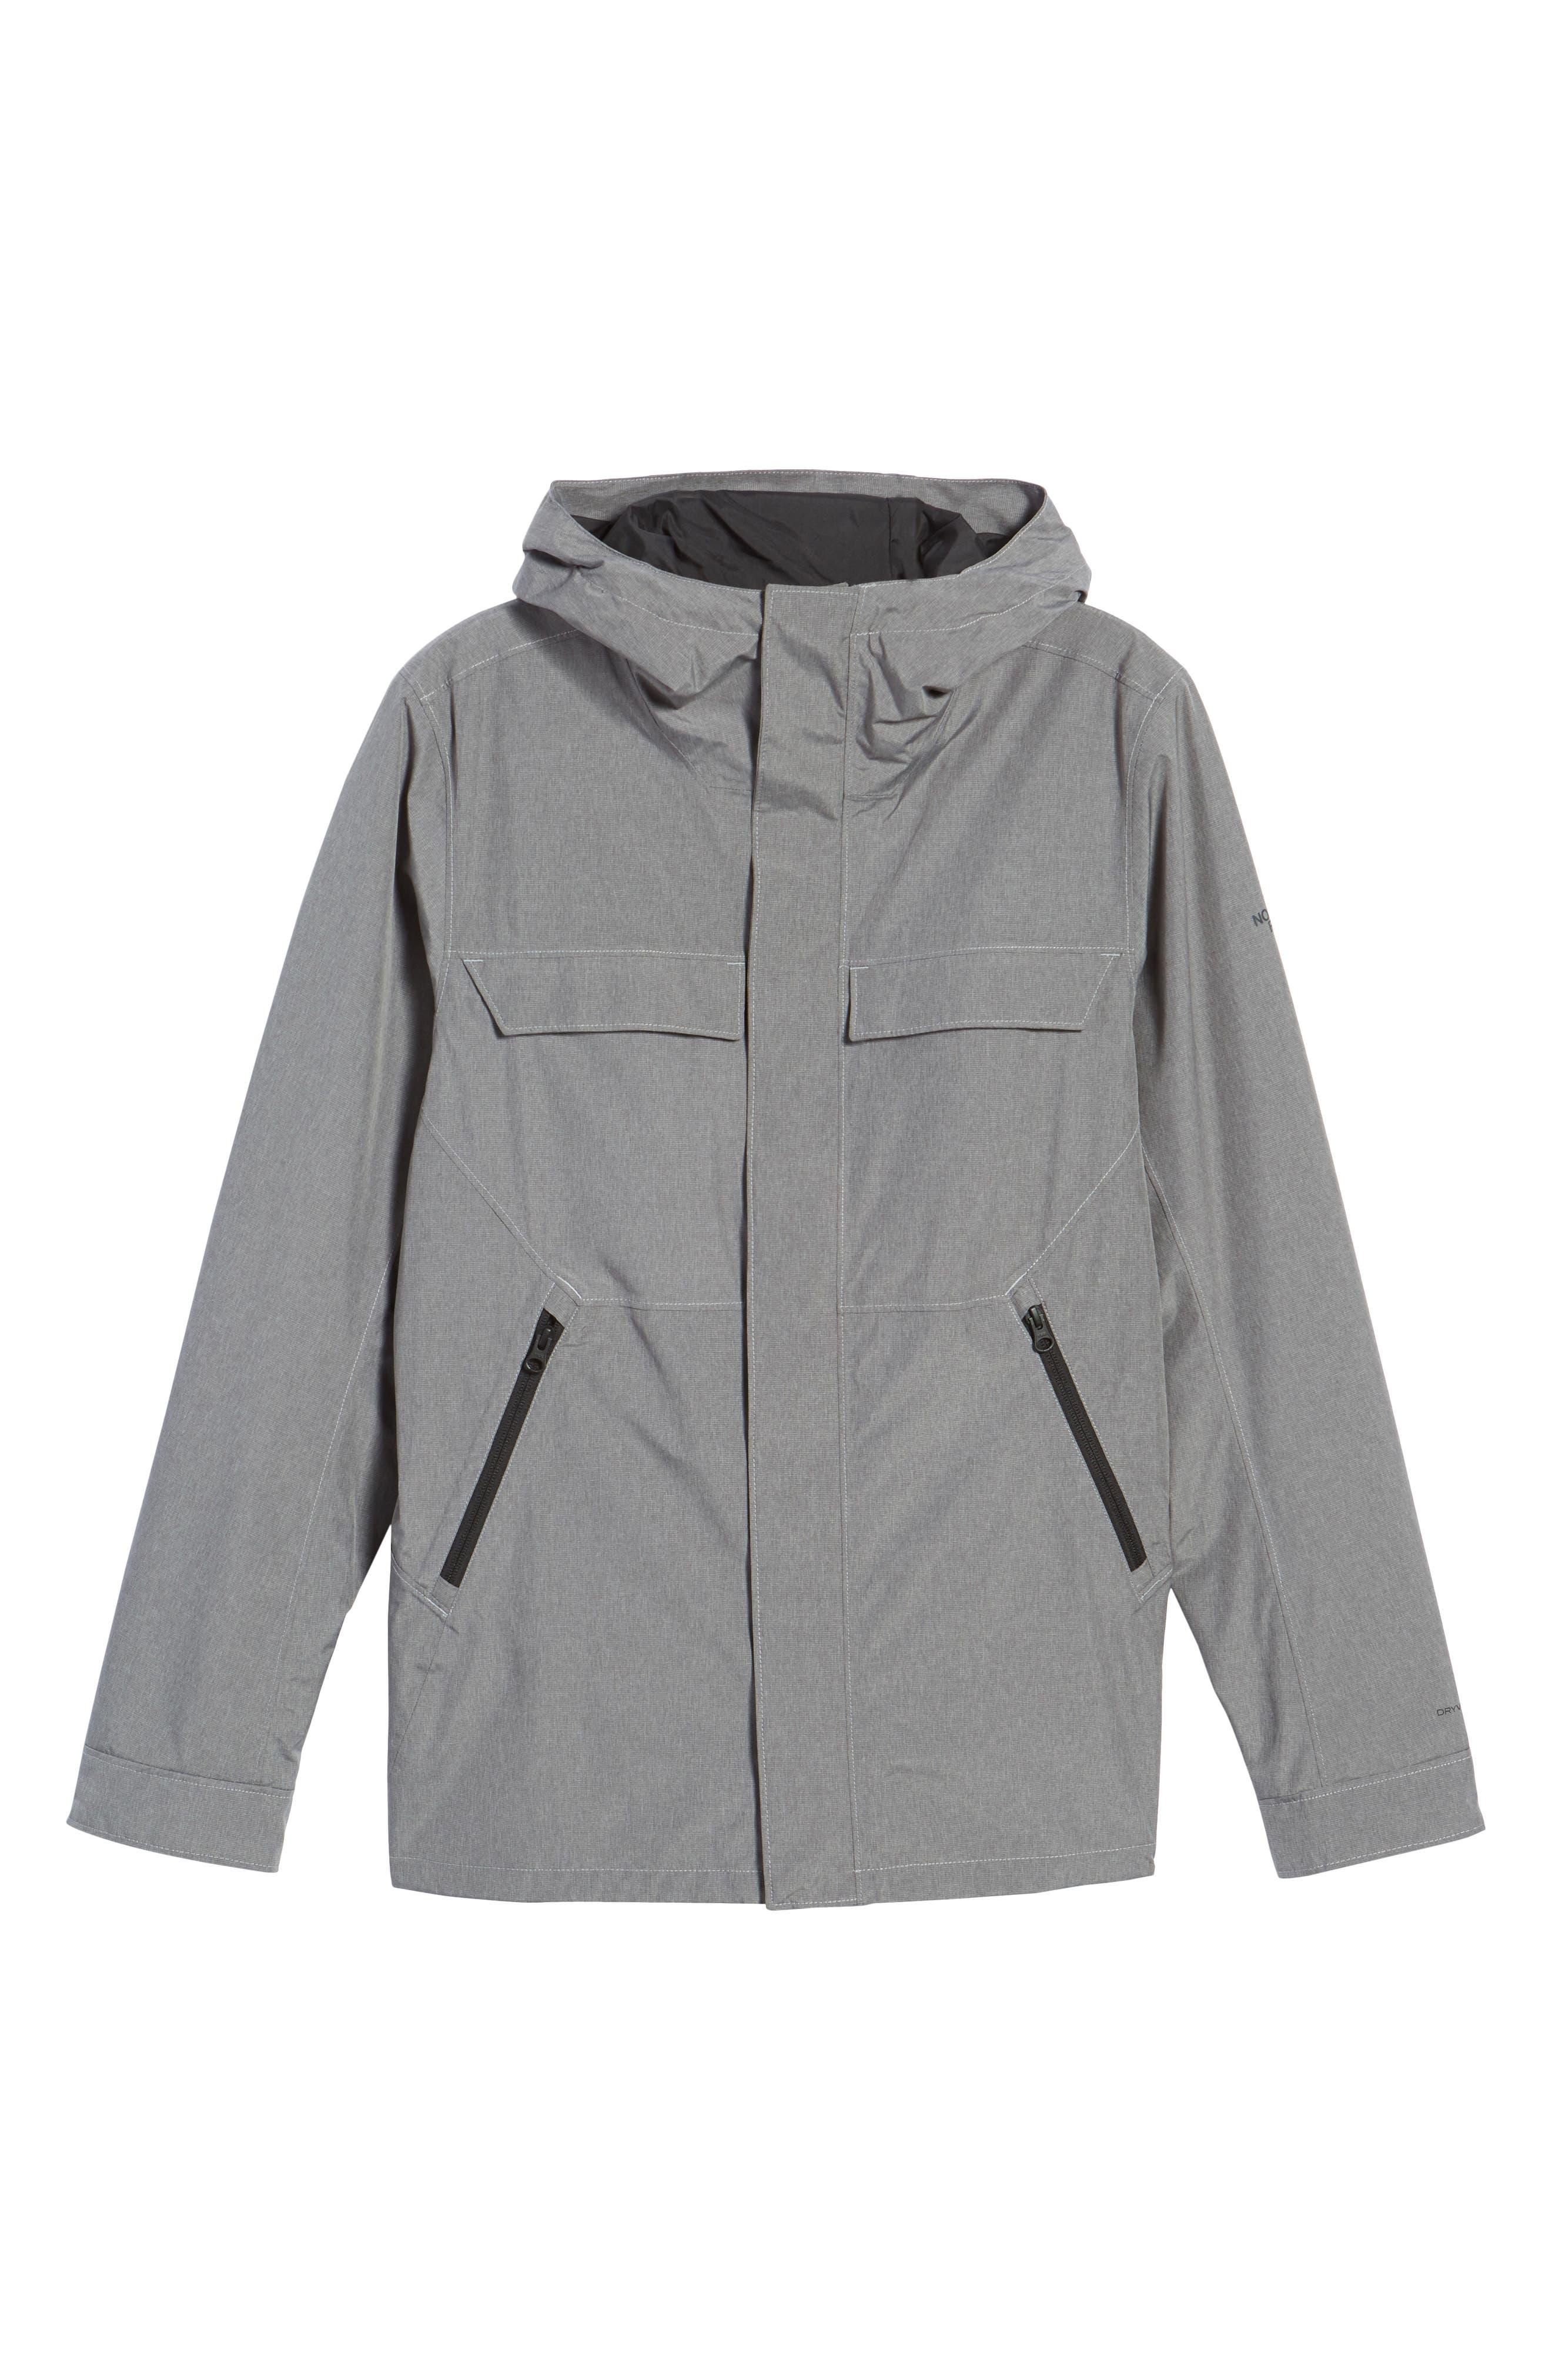 Jenison II Insulated Waterproof Jacket,                             Alternate thumbnail 5, color,                             TNF MEDIUM GREY HEATHER